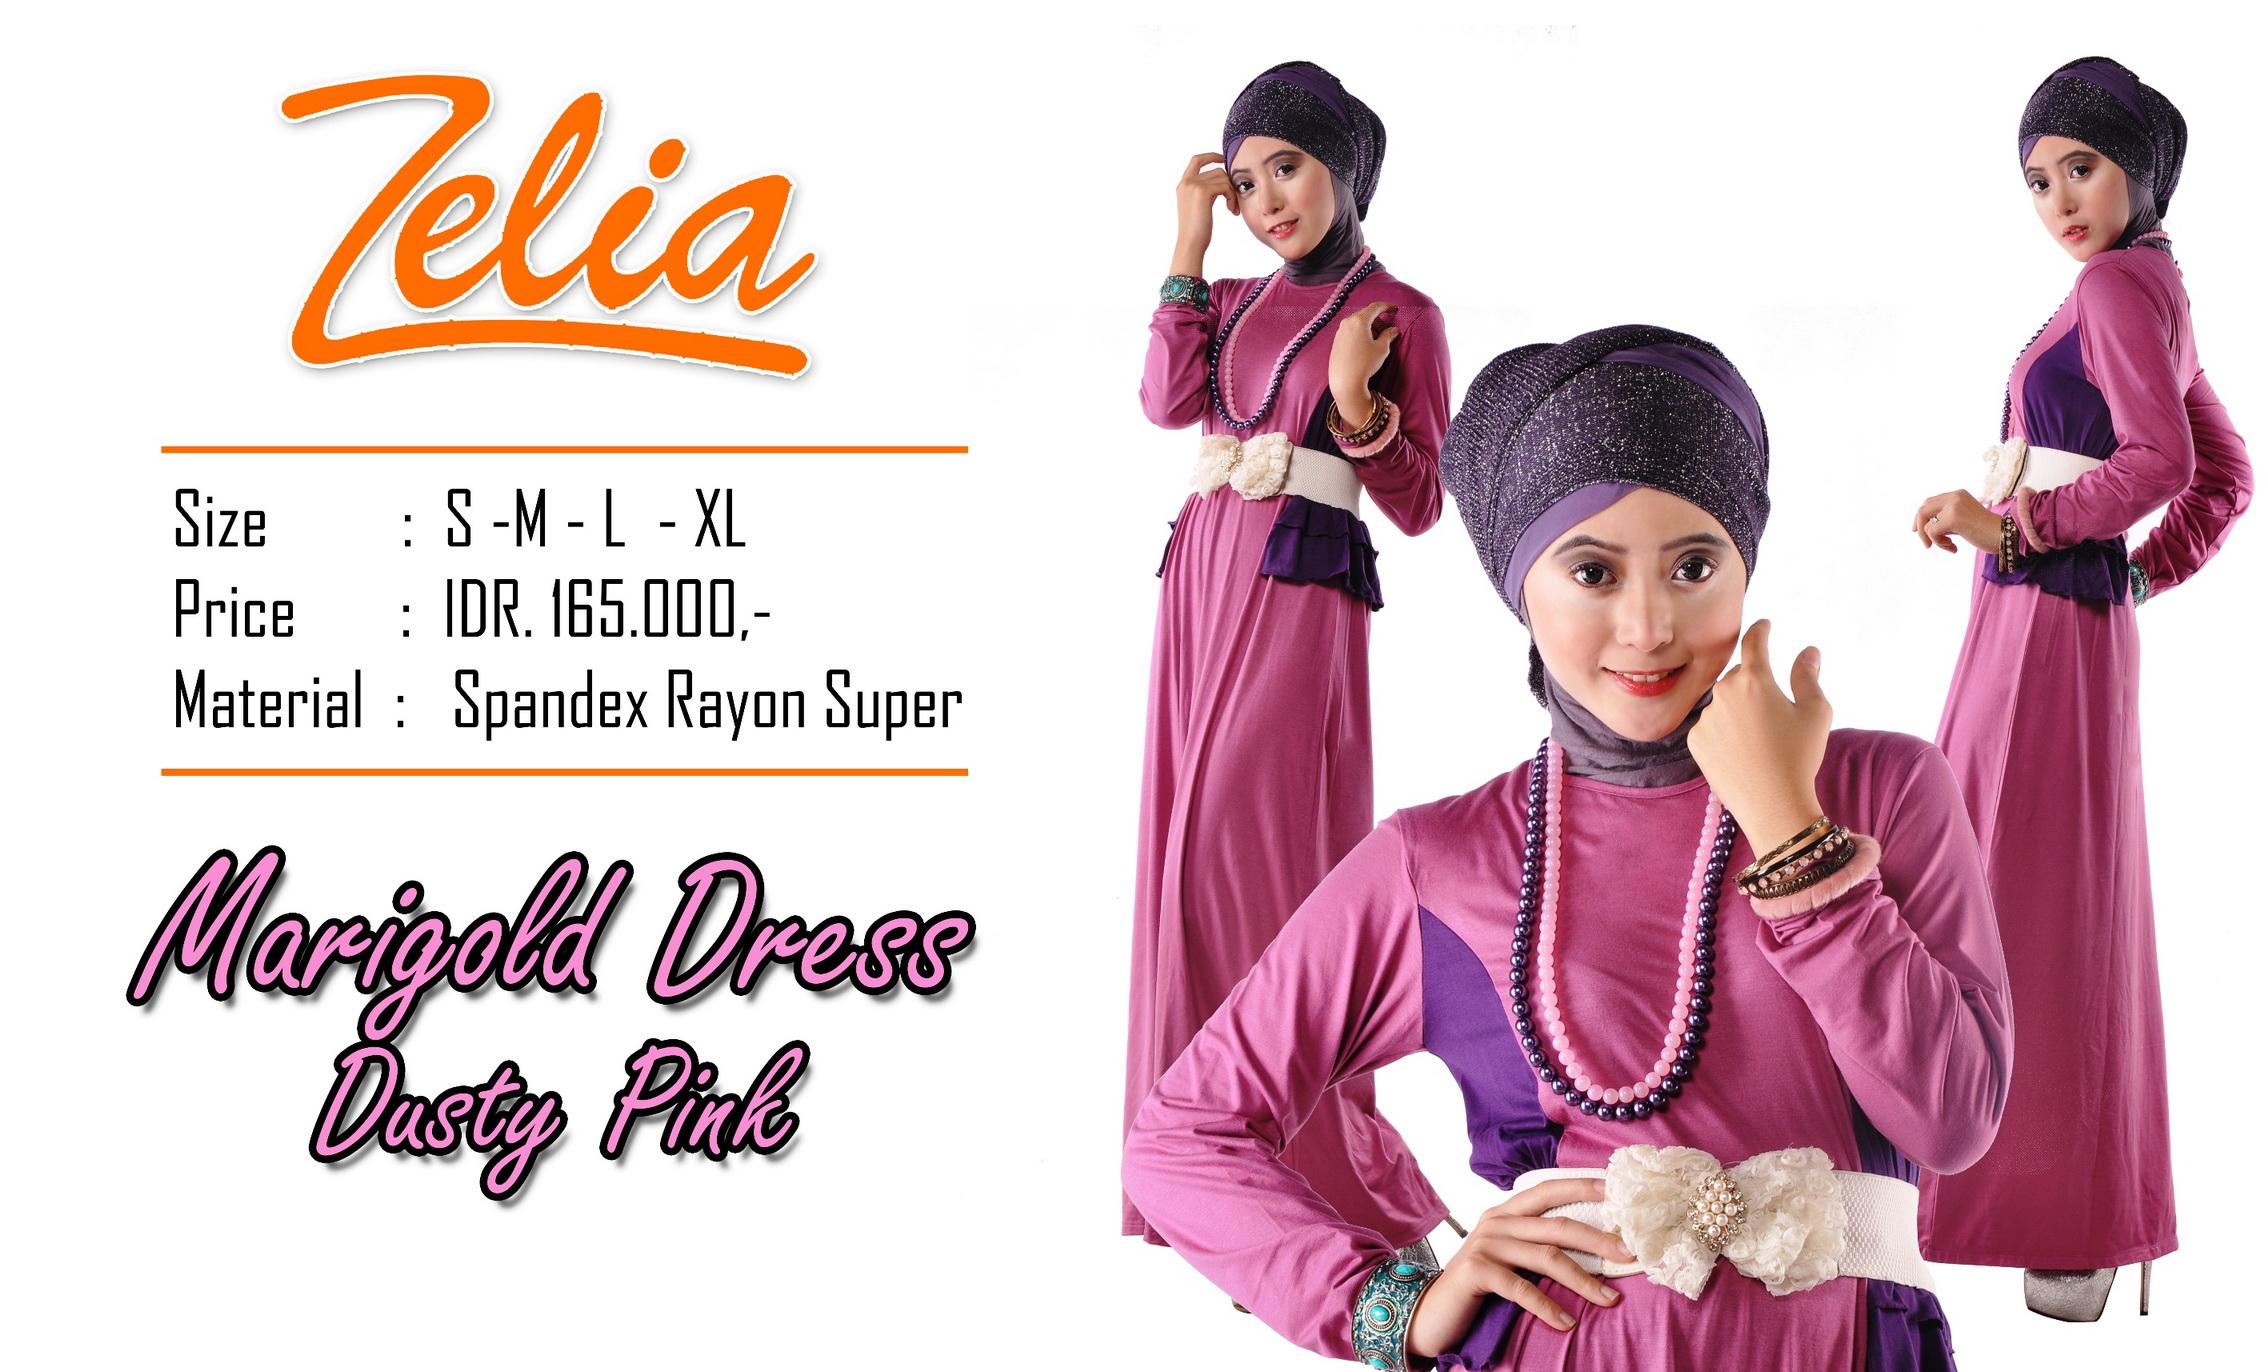 baju muslim modern, Pusat-Gamis-Terbaru-Zelia-Marigold-Dress-Dusty-pink